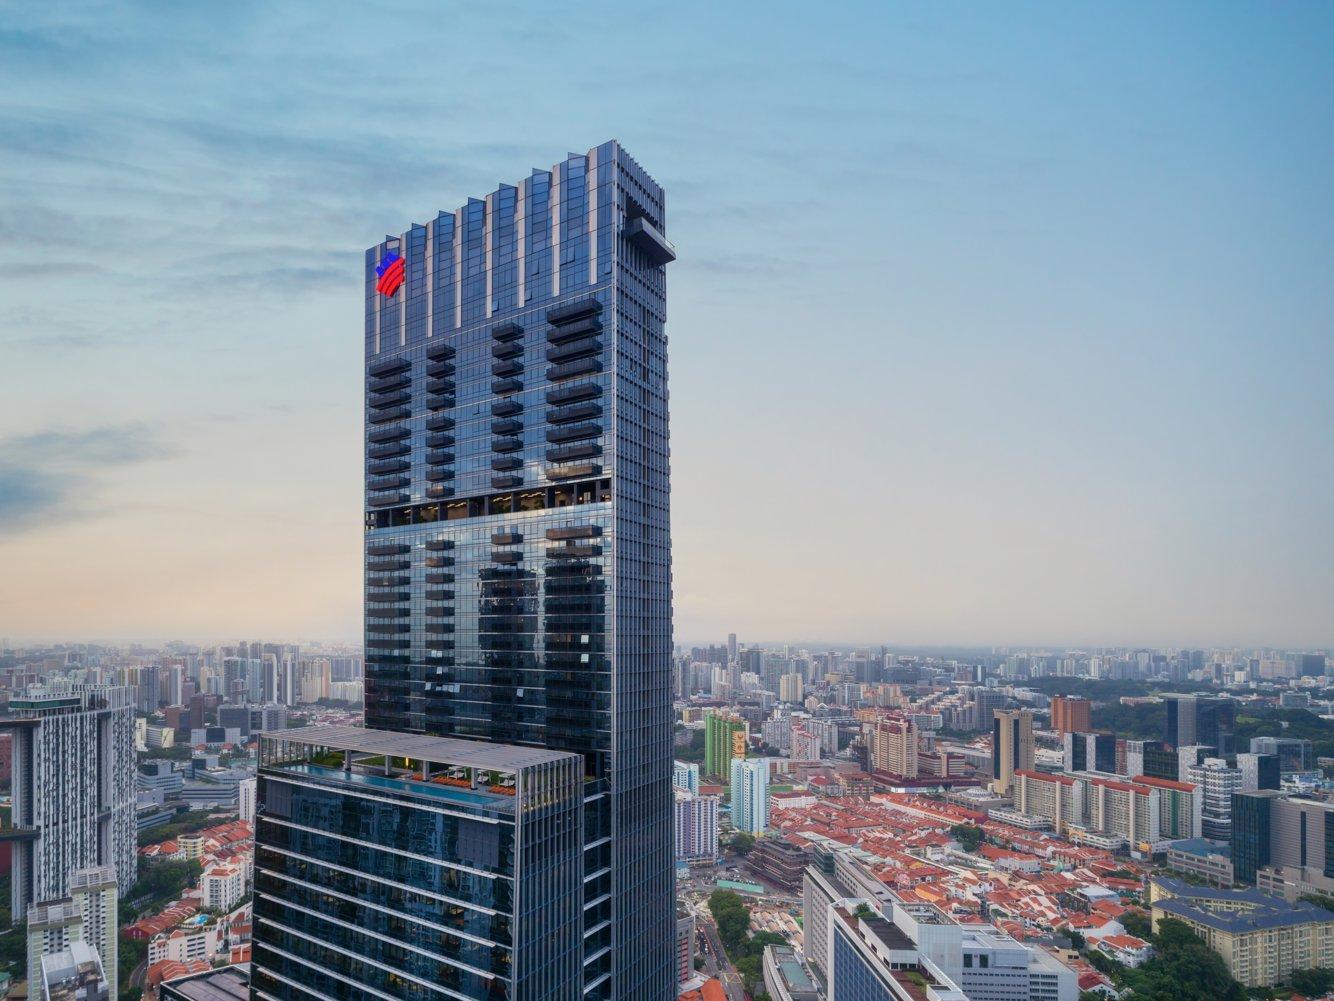 tòa tháp Guoco Tower